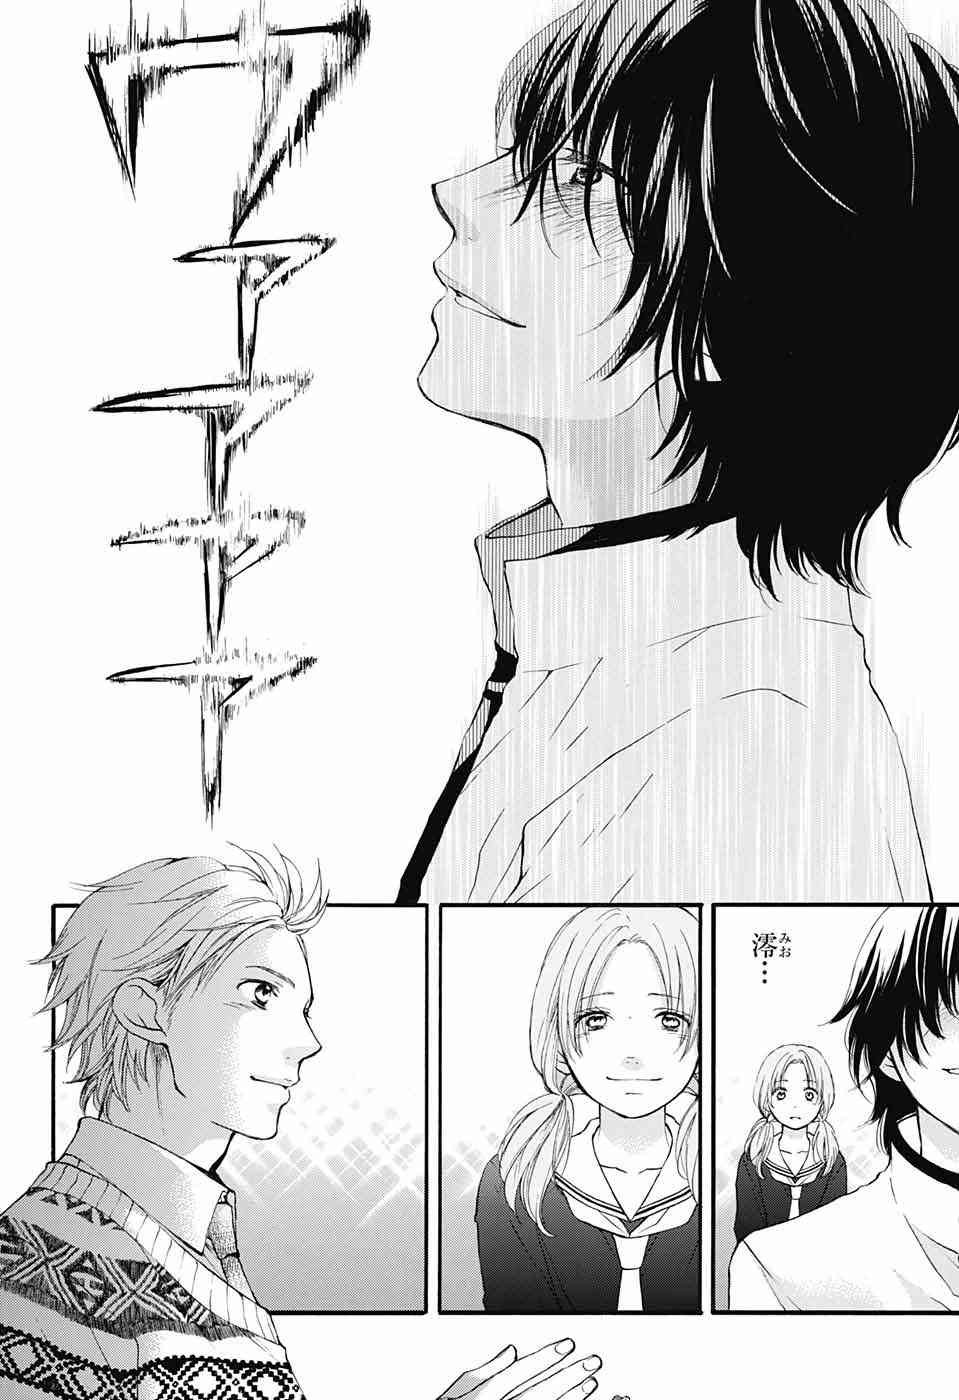 Kono Oto Tomare! - Chapter 50 - Page 2